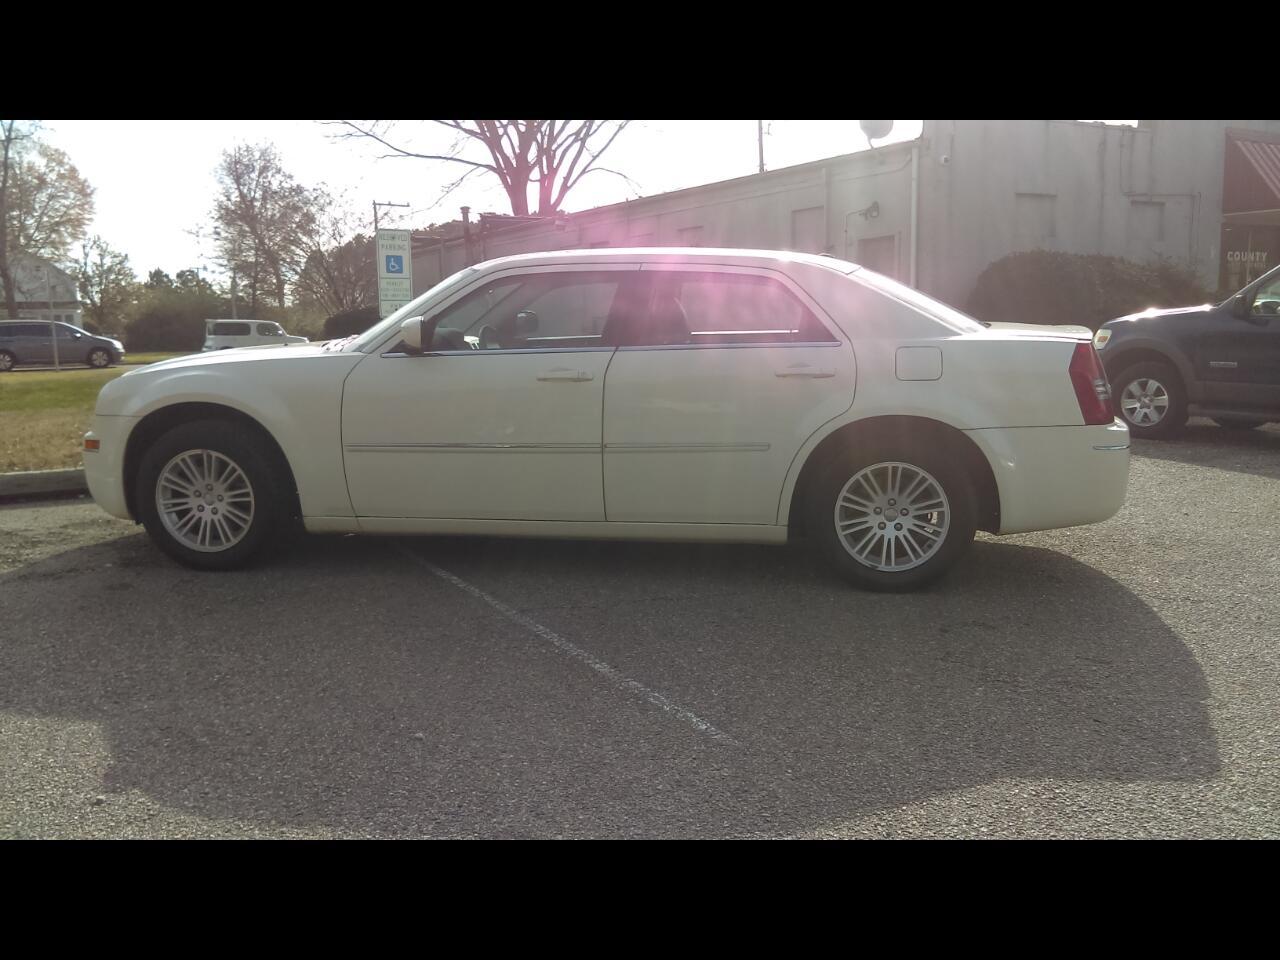 2009 Chrysler 300 4dr Sdn Touring RWD